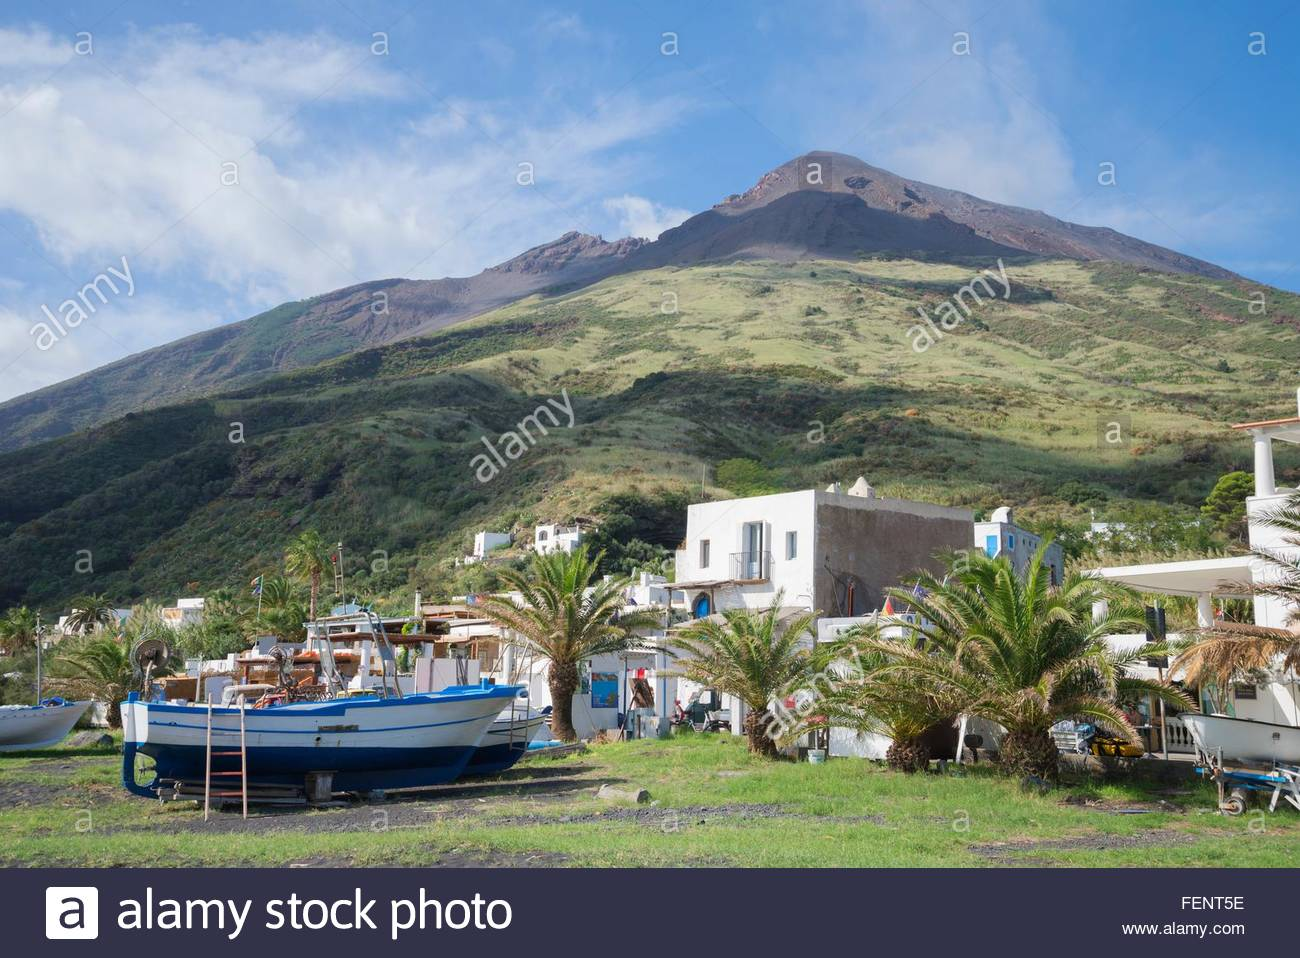 Häuser und Boote auf Stromboli, Äolischen Inseln, Sizilien, Italien Stockbild